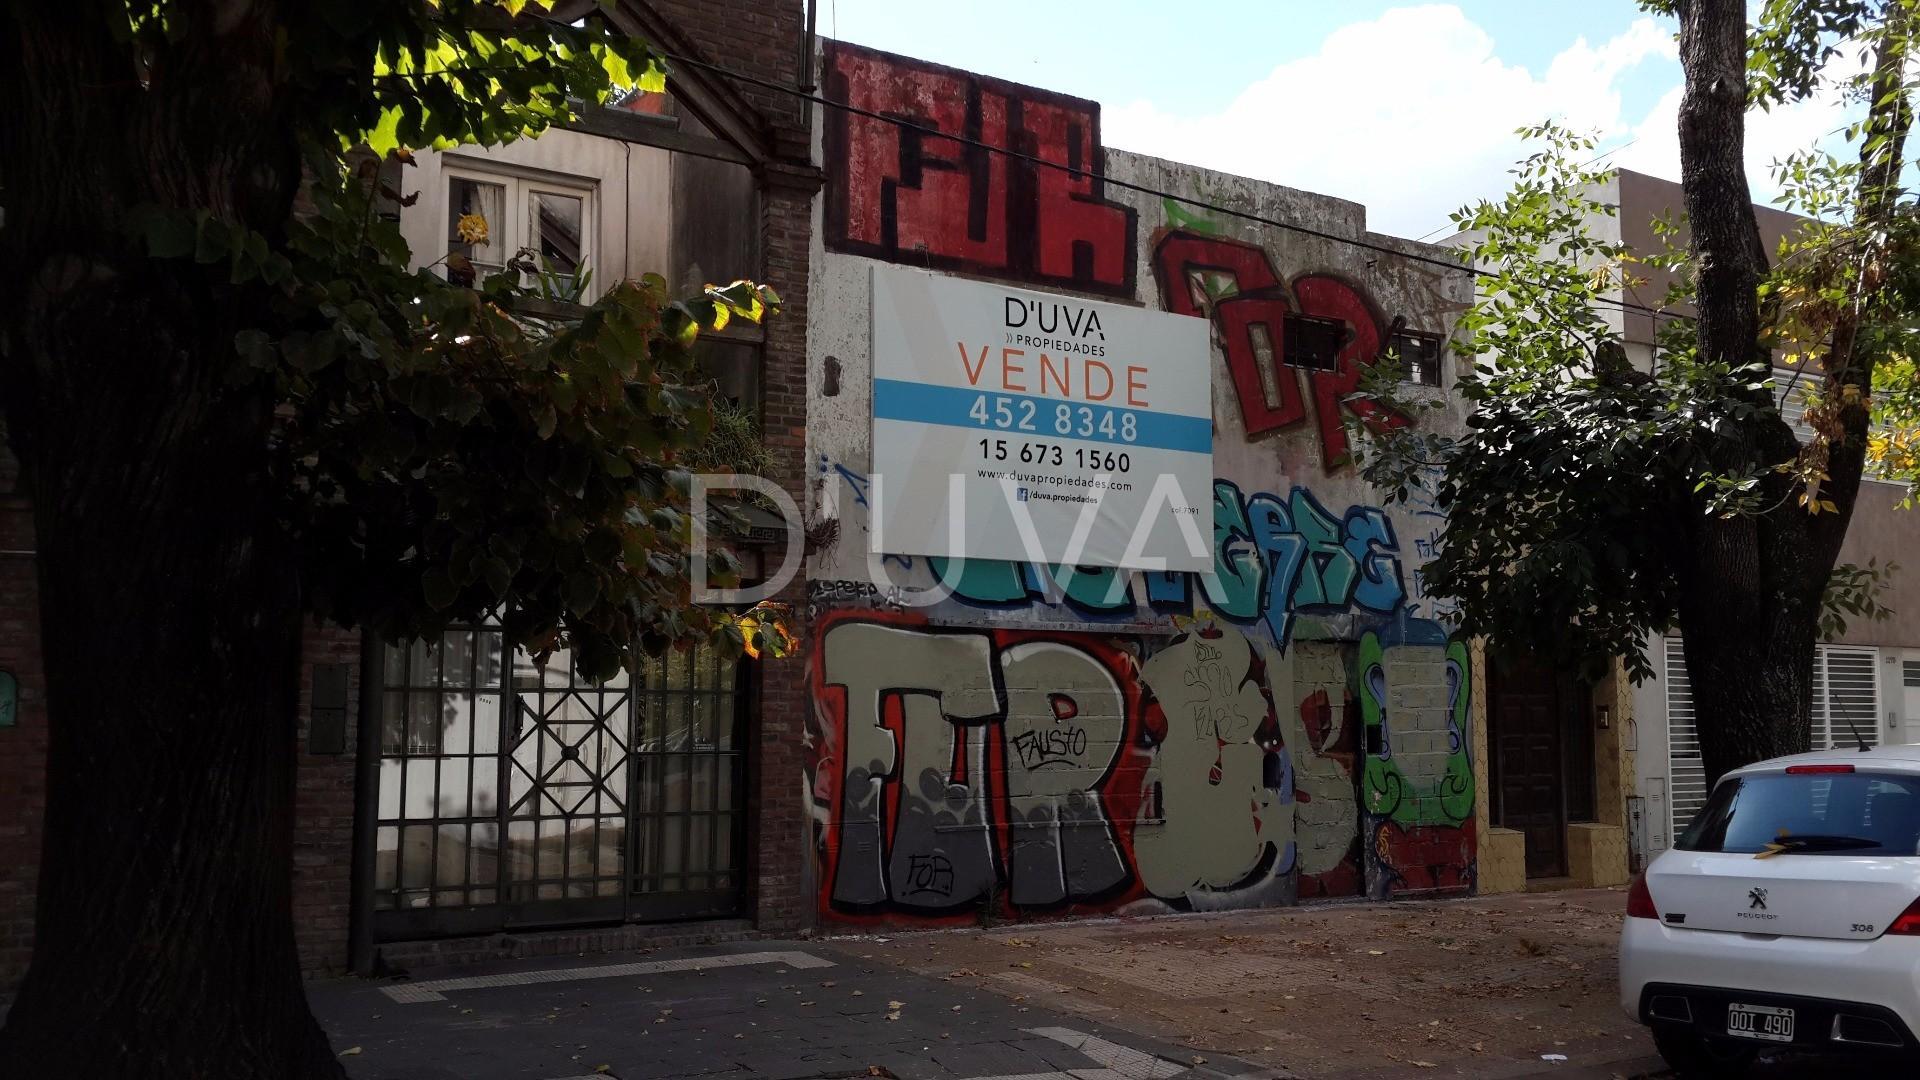 VENTA LOTE- Calle 56 e/ 18 y 19